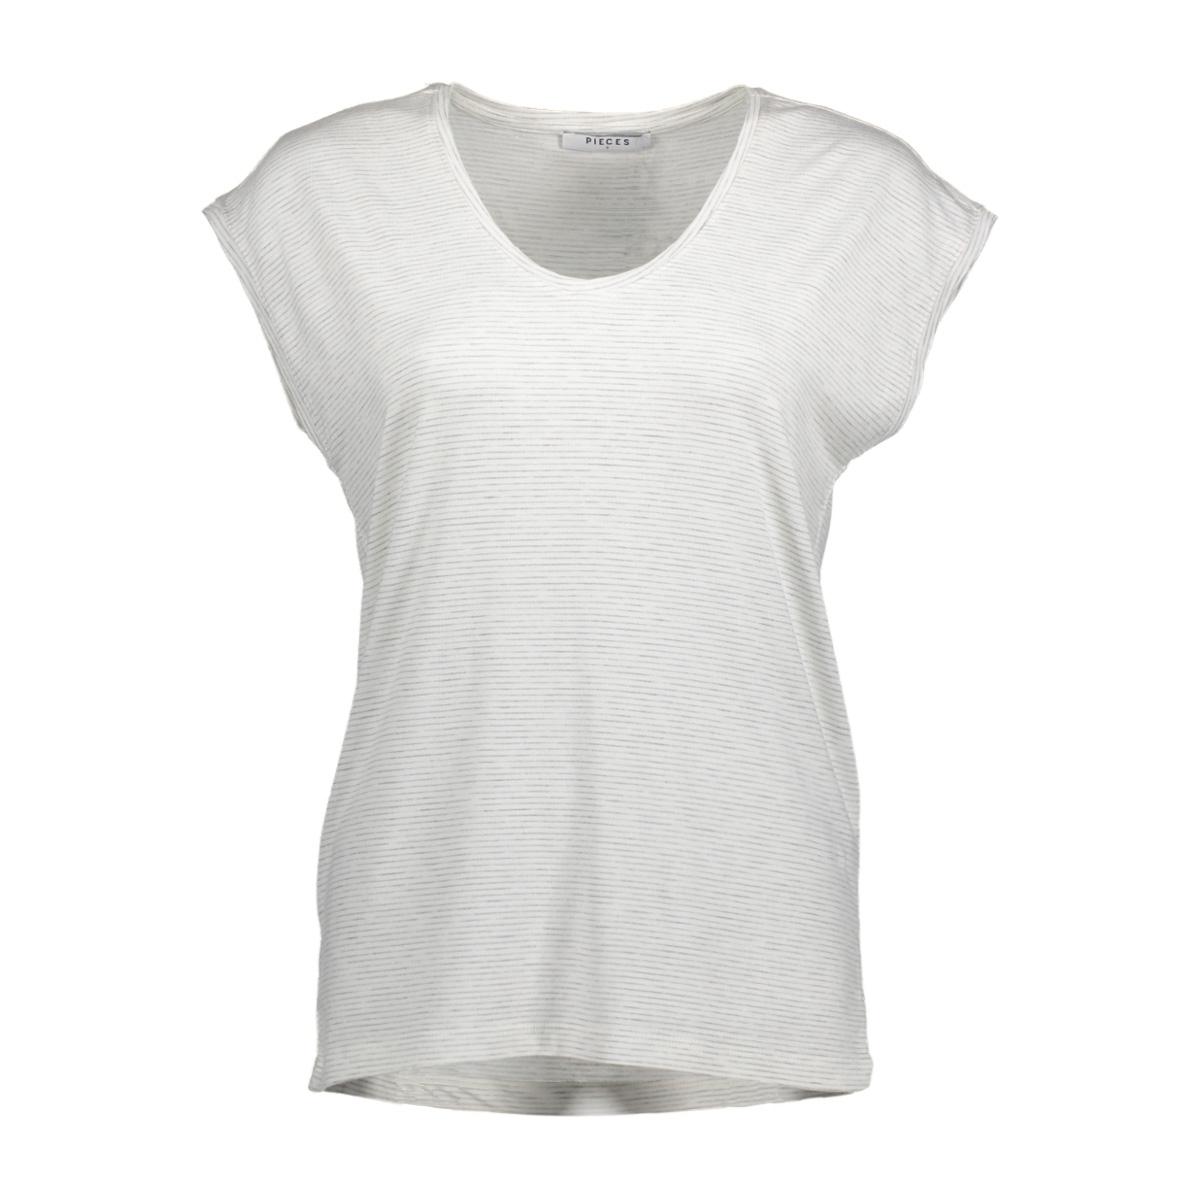 pcbillo tee noos 17074036 pieces t-shirt bright white/light grey